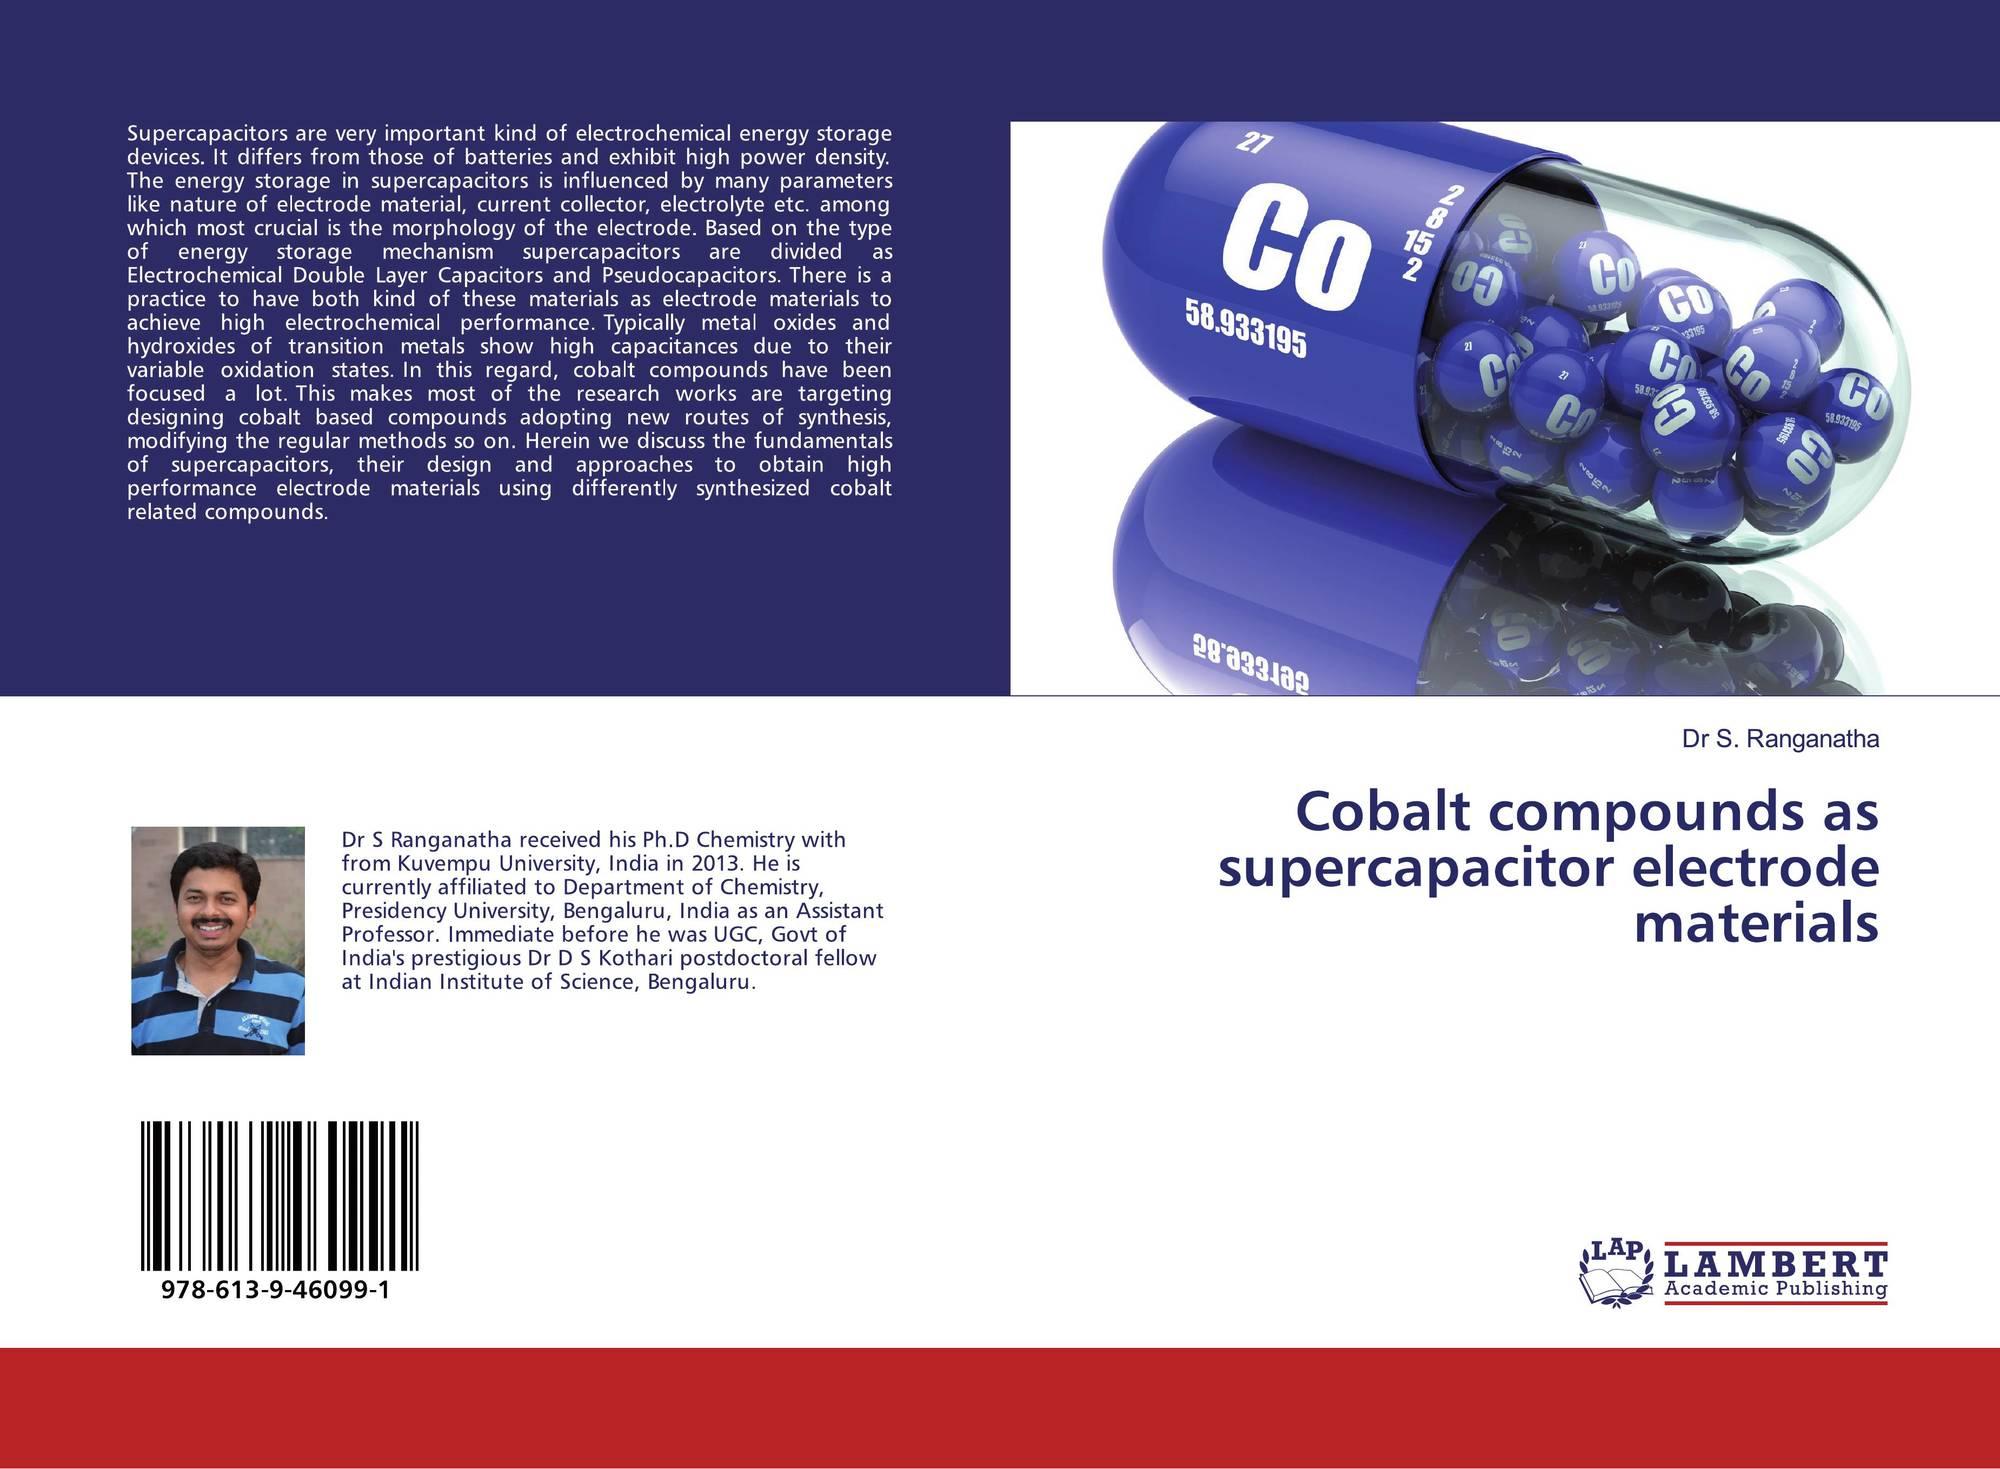 Cobalt compounds as supercapacitor electrode materials, 978